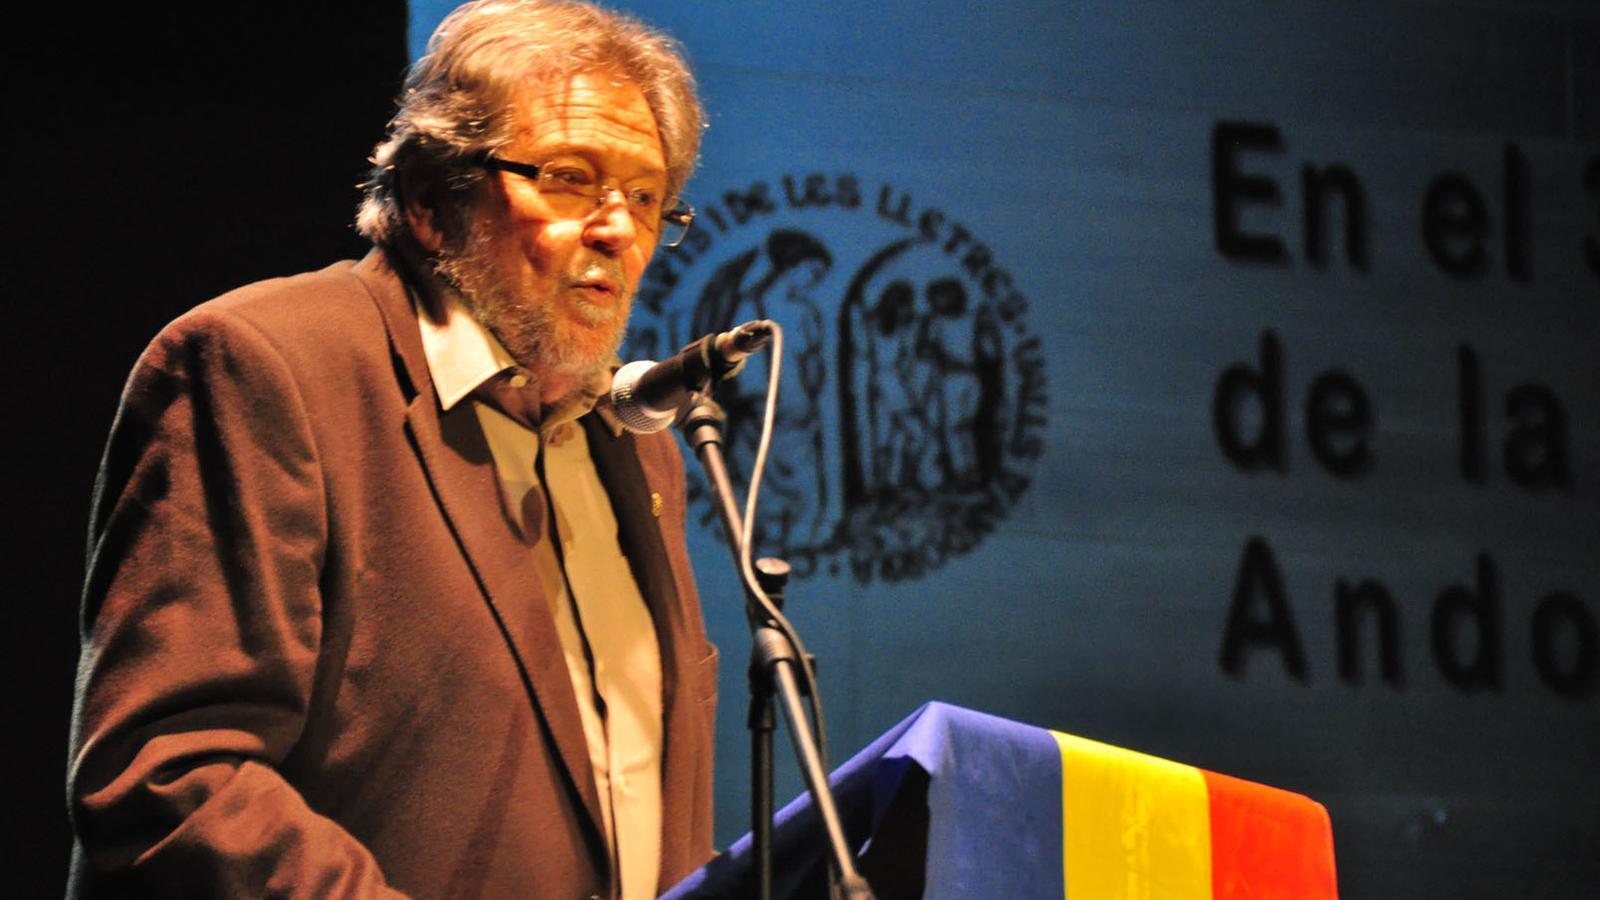 Josep Anton Rosell, en una imatge del 2012 recollint el Premi Tristaina de Periodisme. / Arxiu ANA